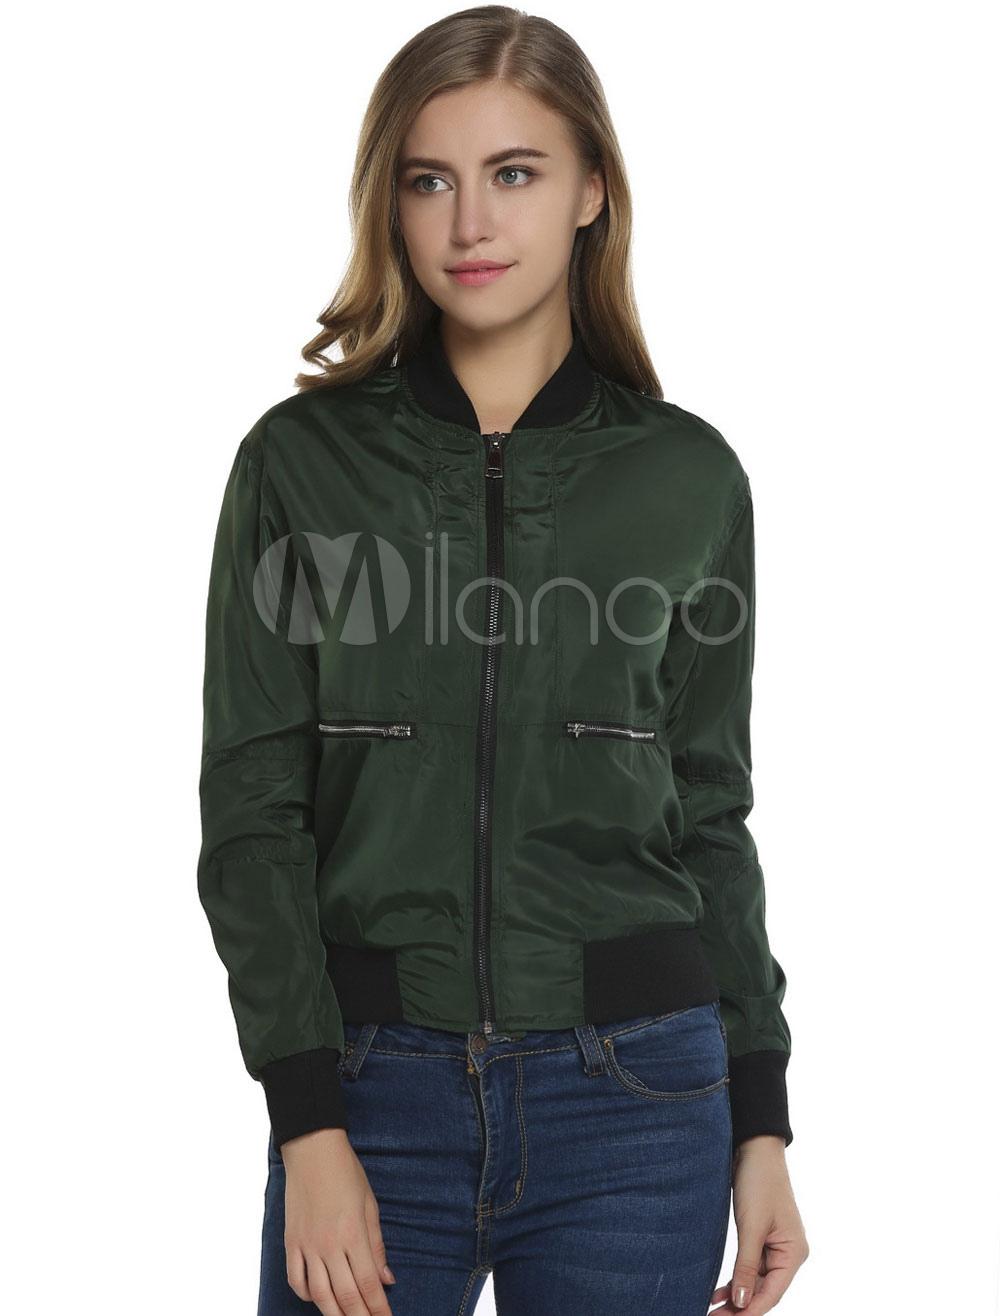 Buy Bomber Jacket Hunter Green Long Sleeve Stand Collar Short Varsity Jackets For Women for $27.89 in Milanoo store